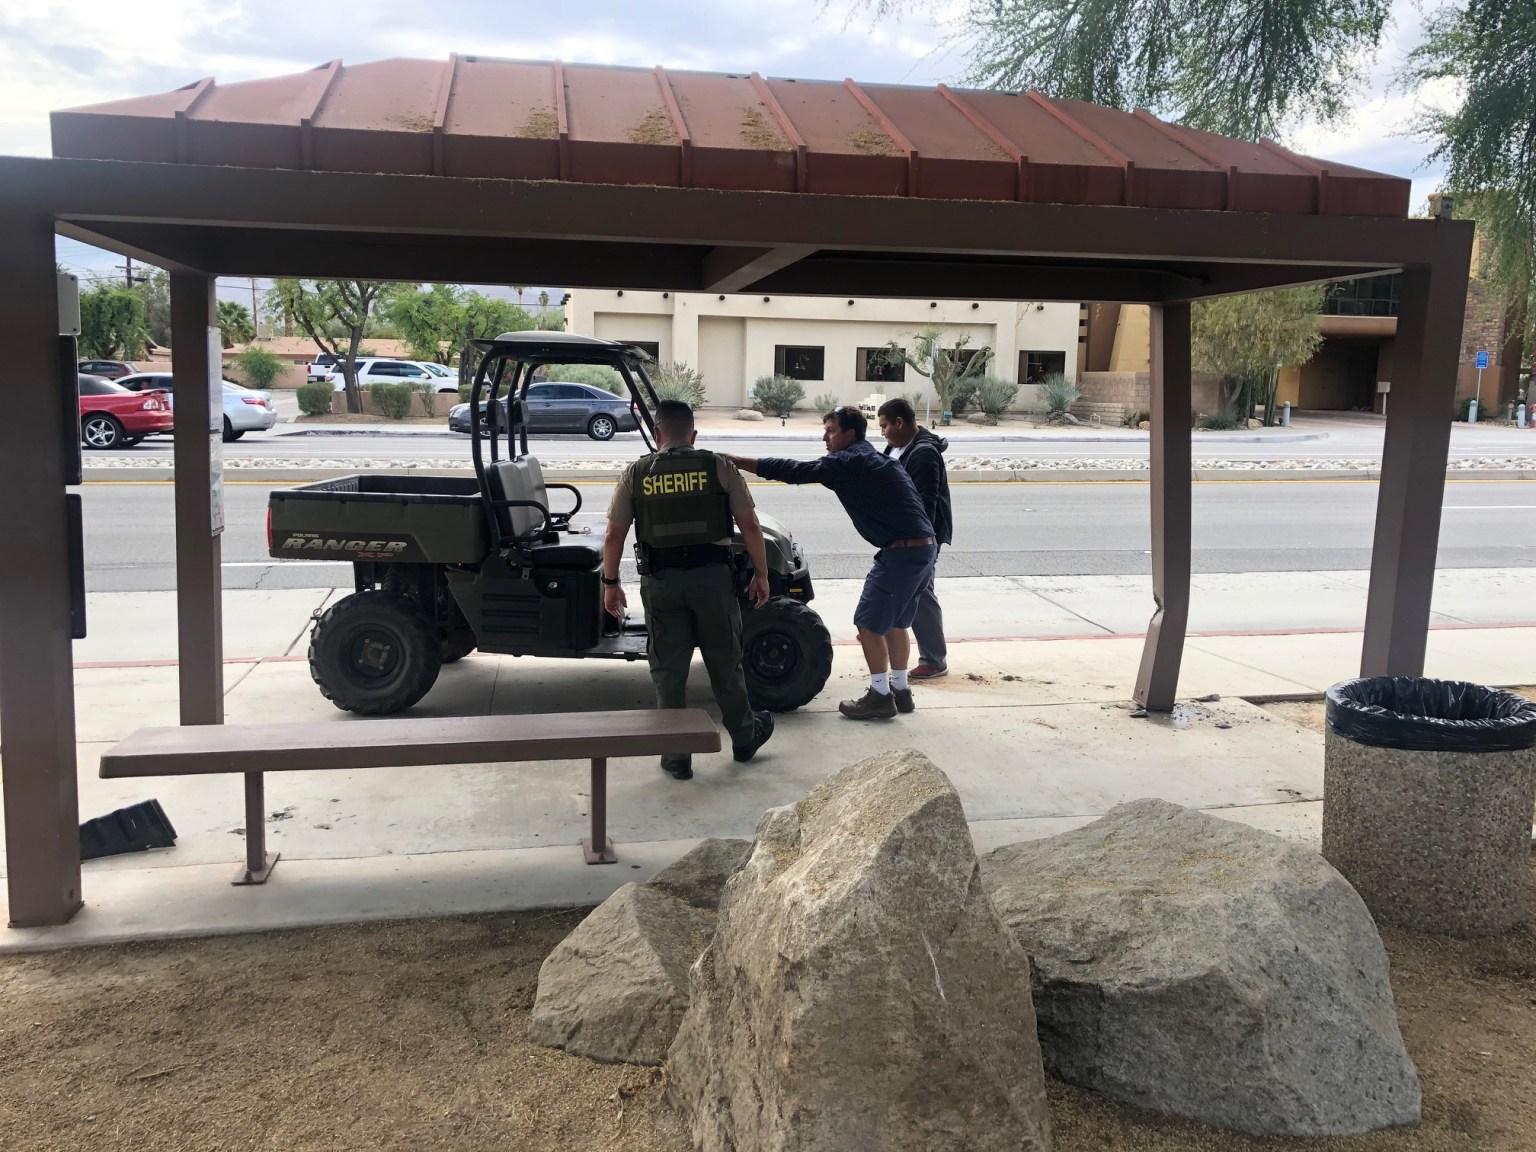 Three Juveniles Arrested for Allegedly Joyriding Stolen UTV in Palm Desert